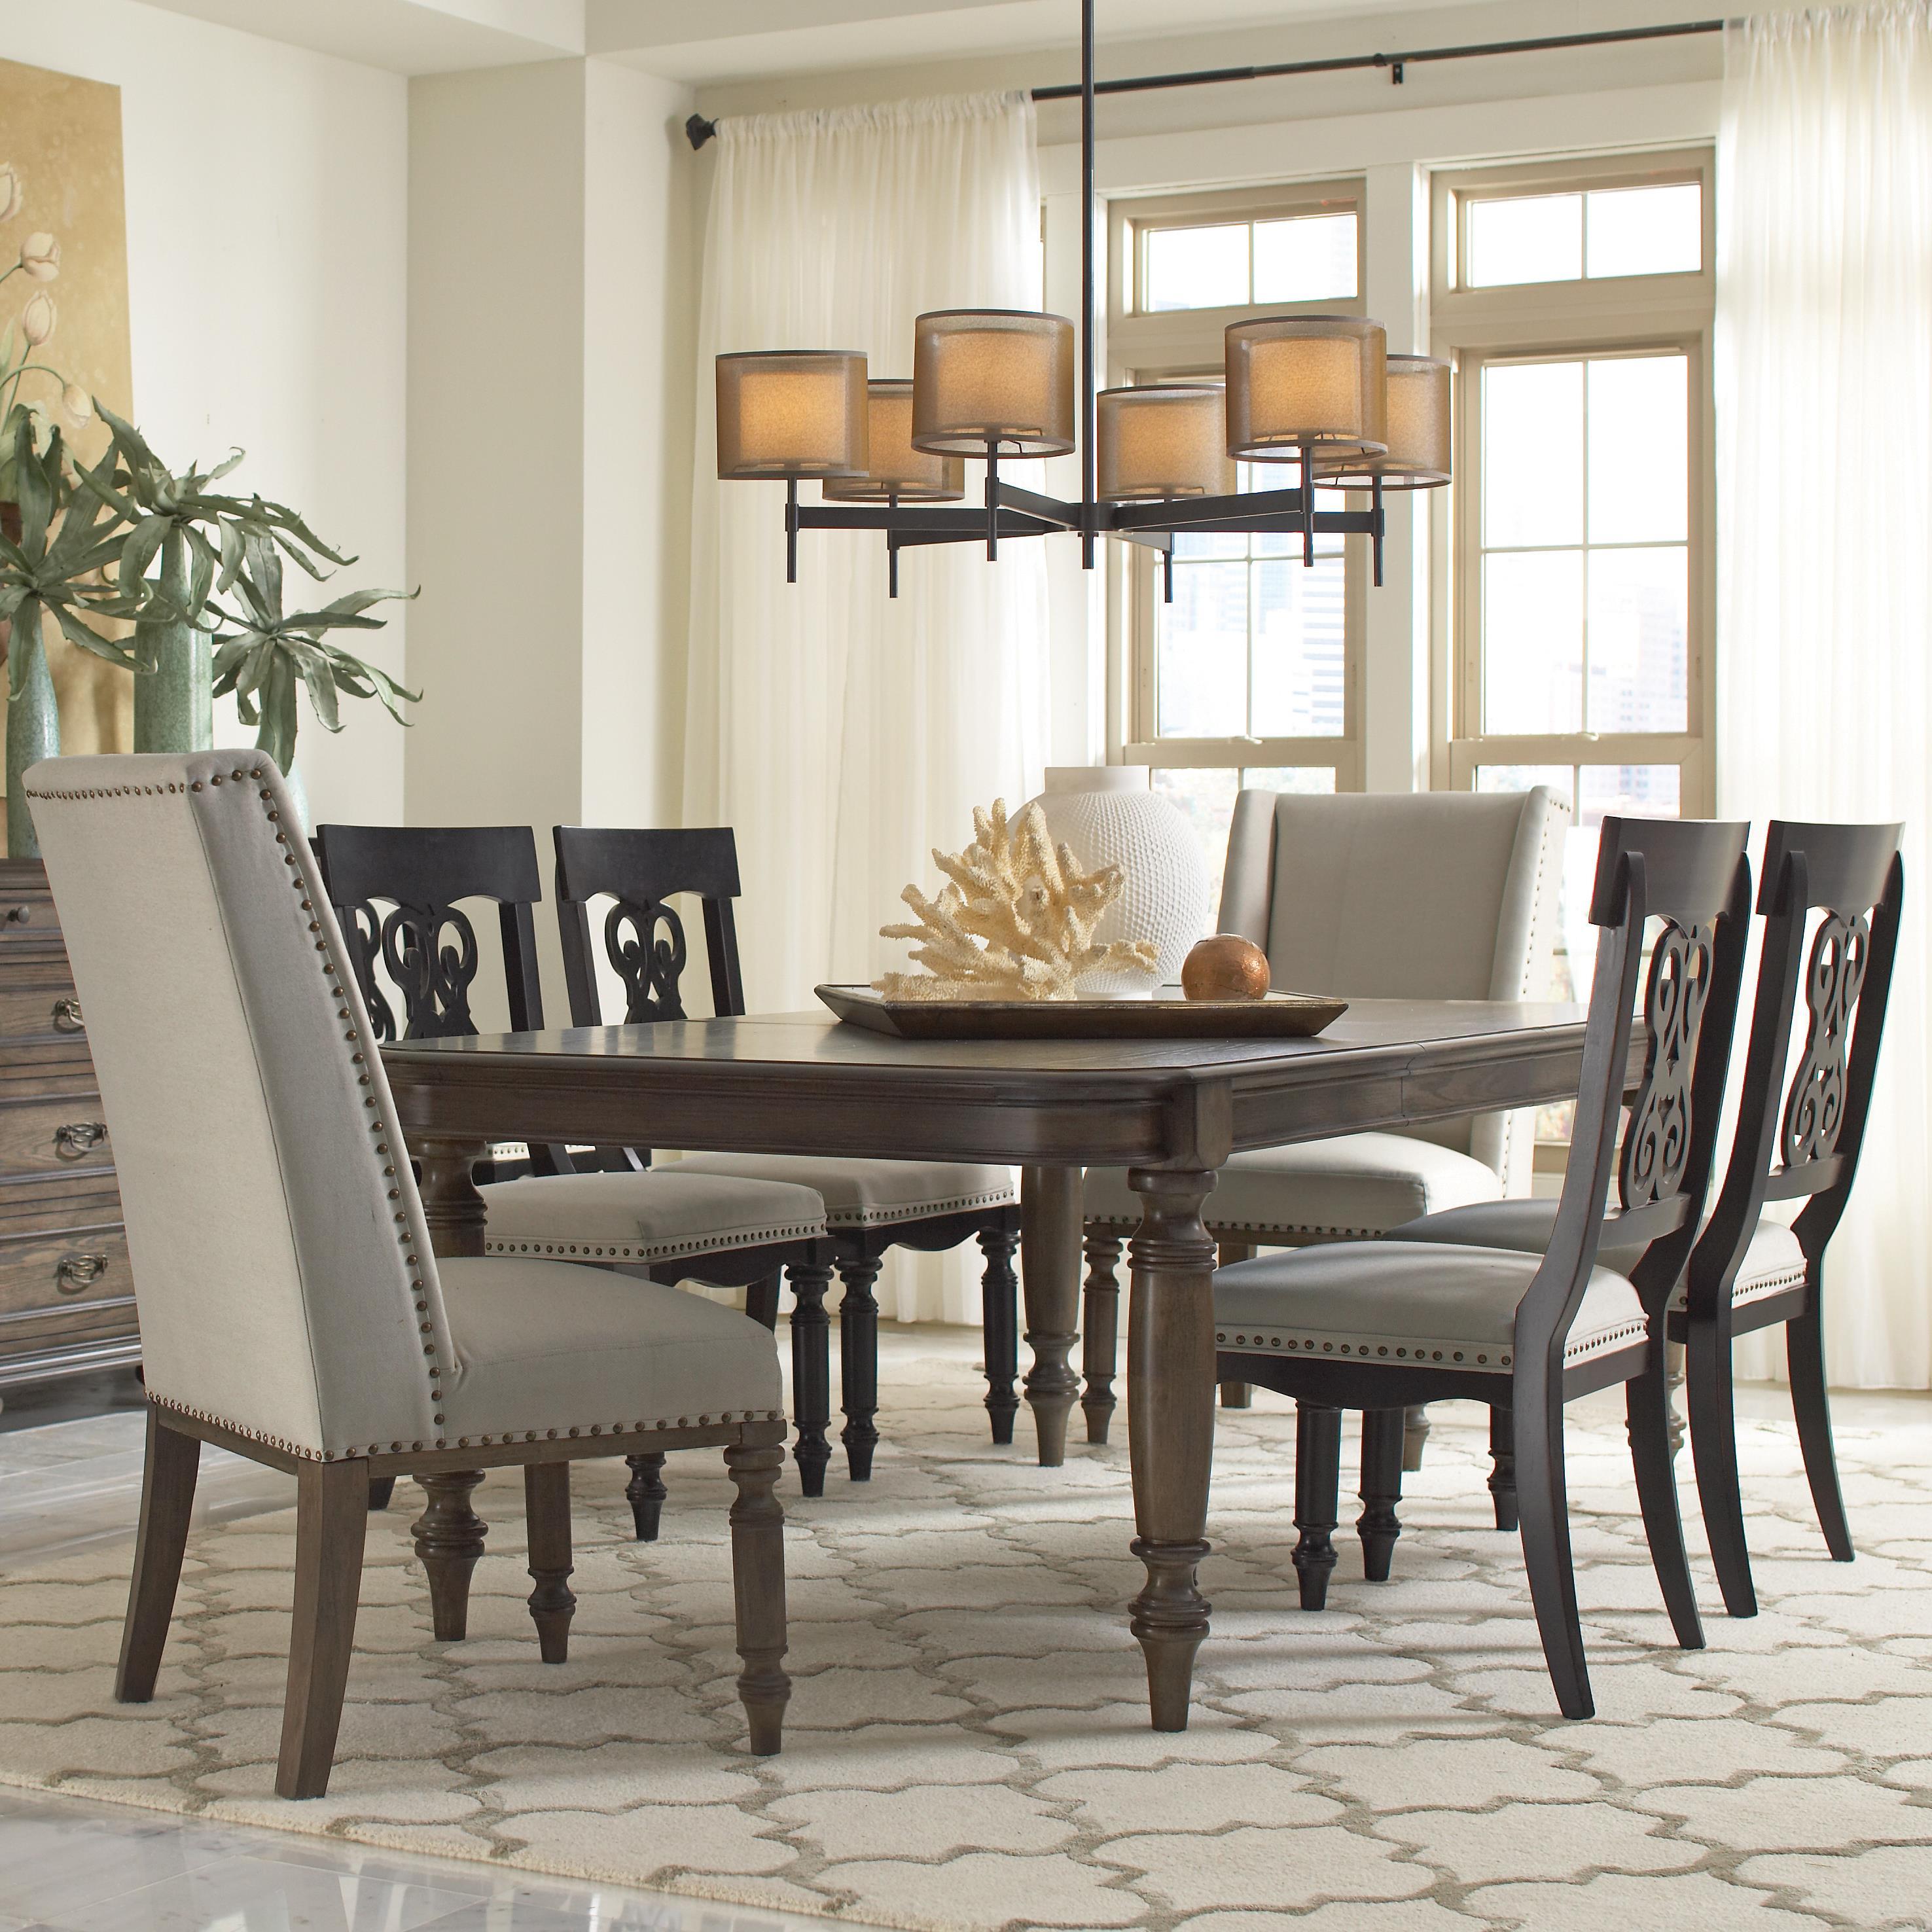 Riverside Furniture Belmeade Hostess Chair W Nailhead Trim Prime Brothers Furniture Dining